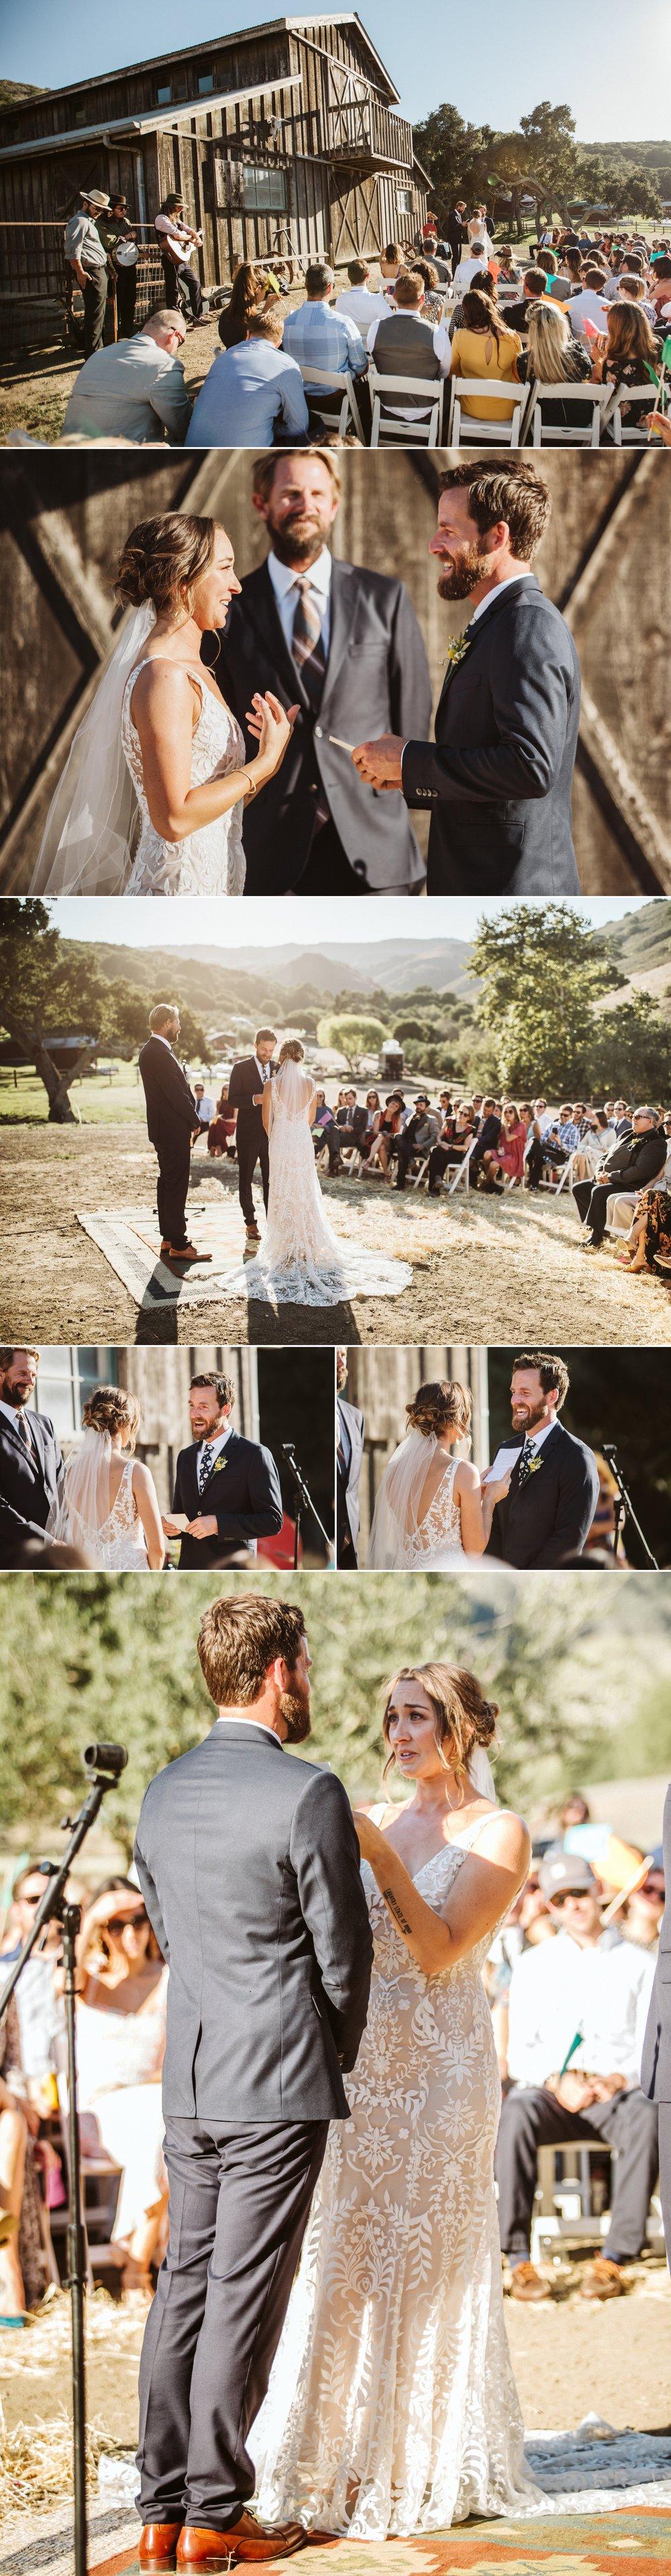 Colorful Barn Wedding at Jalama Canon Ranch- Lompoc- Santa Barbara- Geoff & Lauren 18.jpg